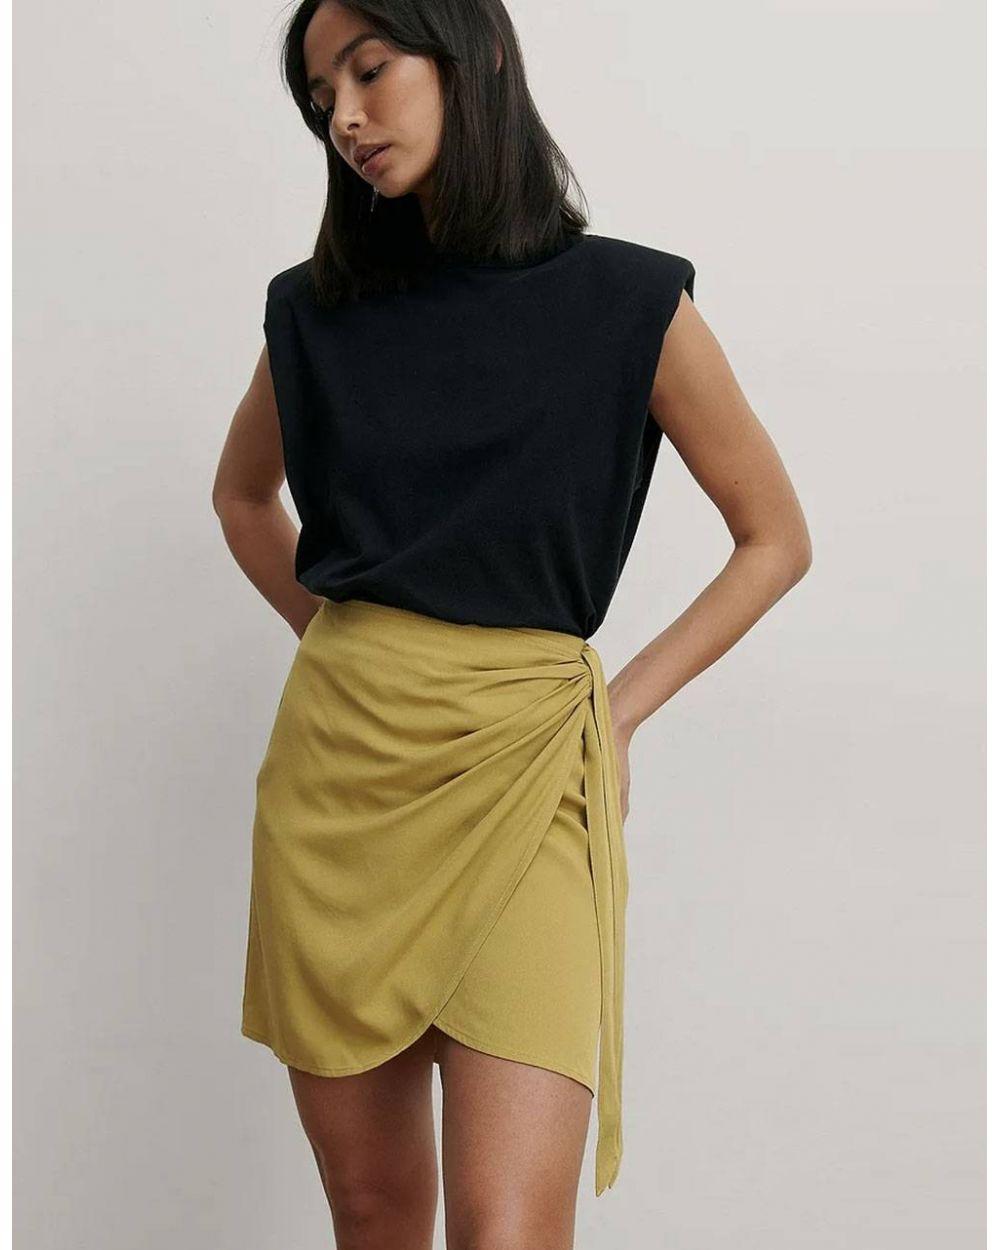 NA-KD overlap side knot mini skirt - olive green NA-KD Skirt 40,98€